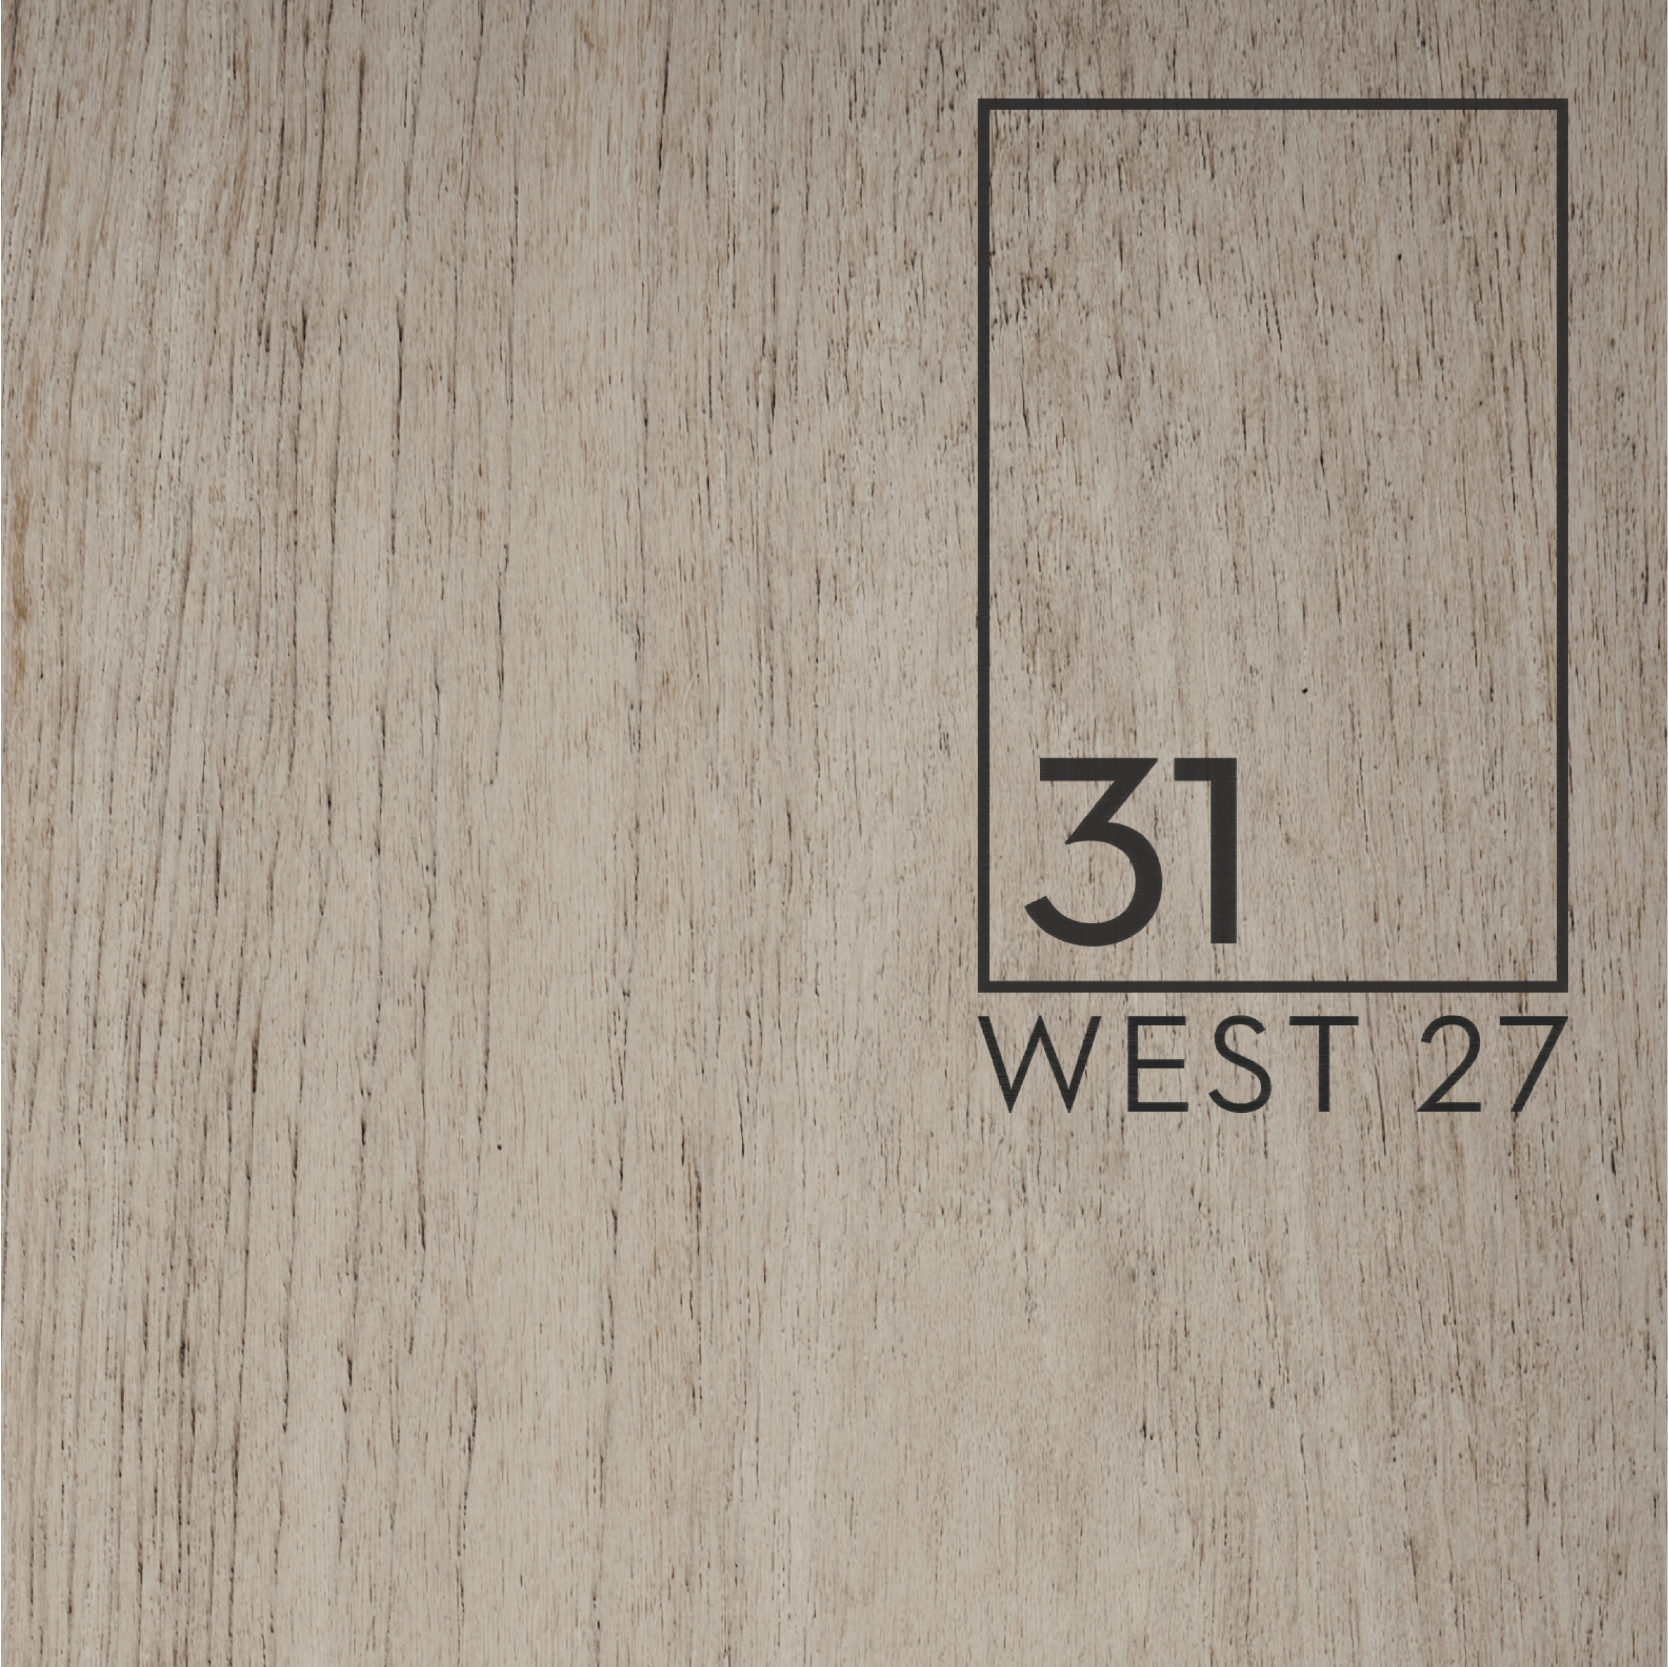 31 w 27 branding mock-02.png